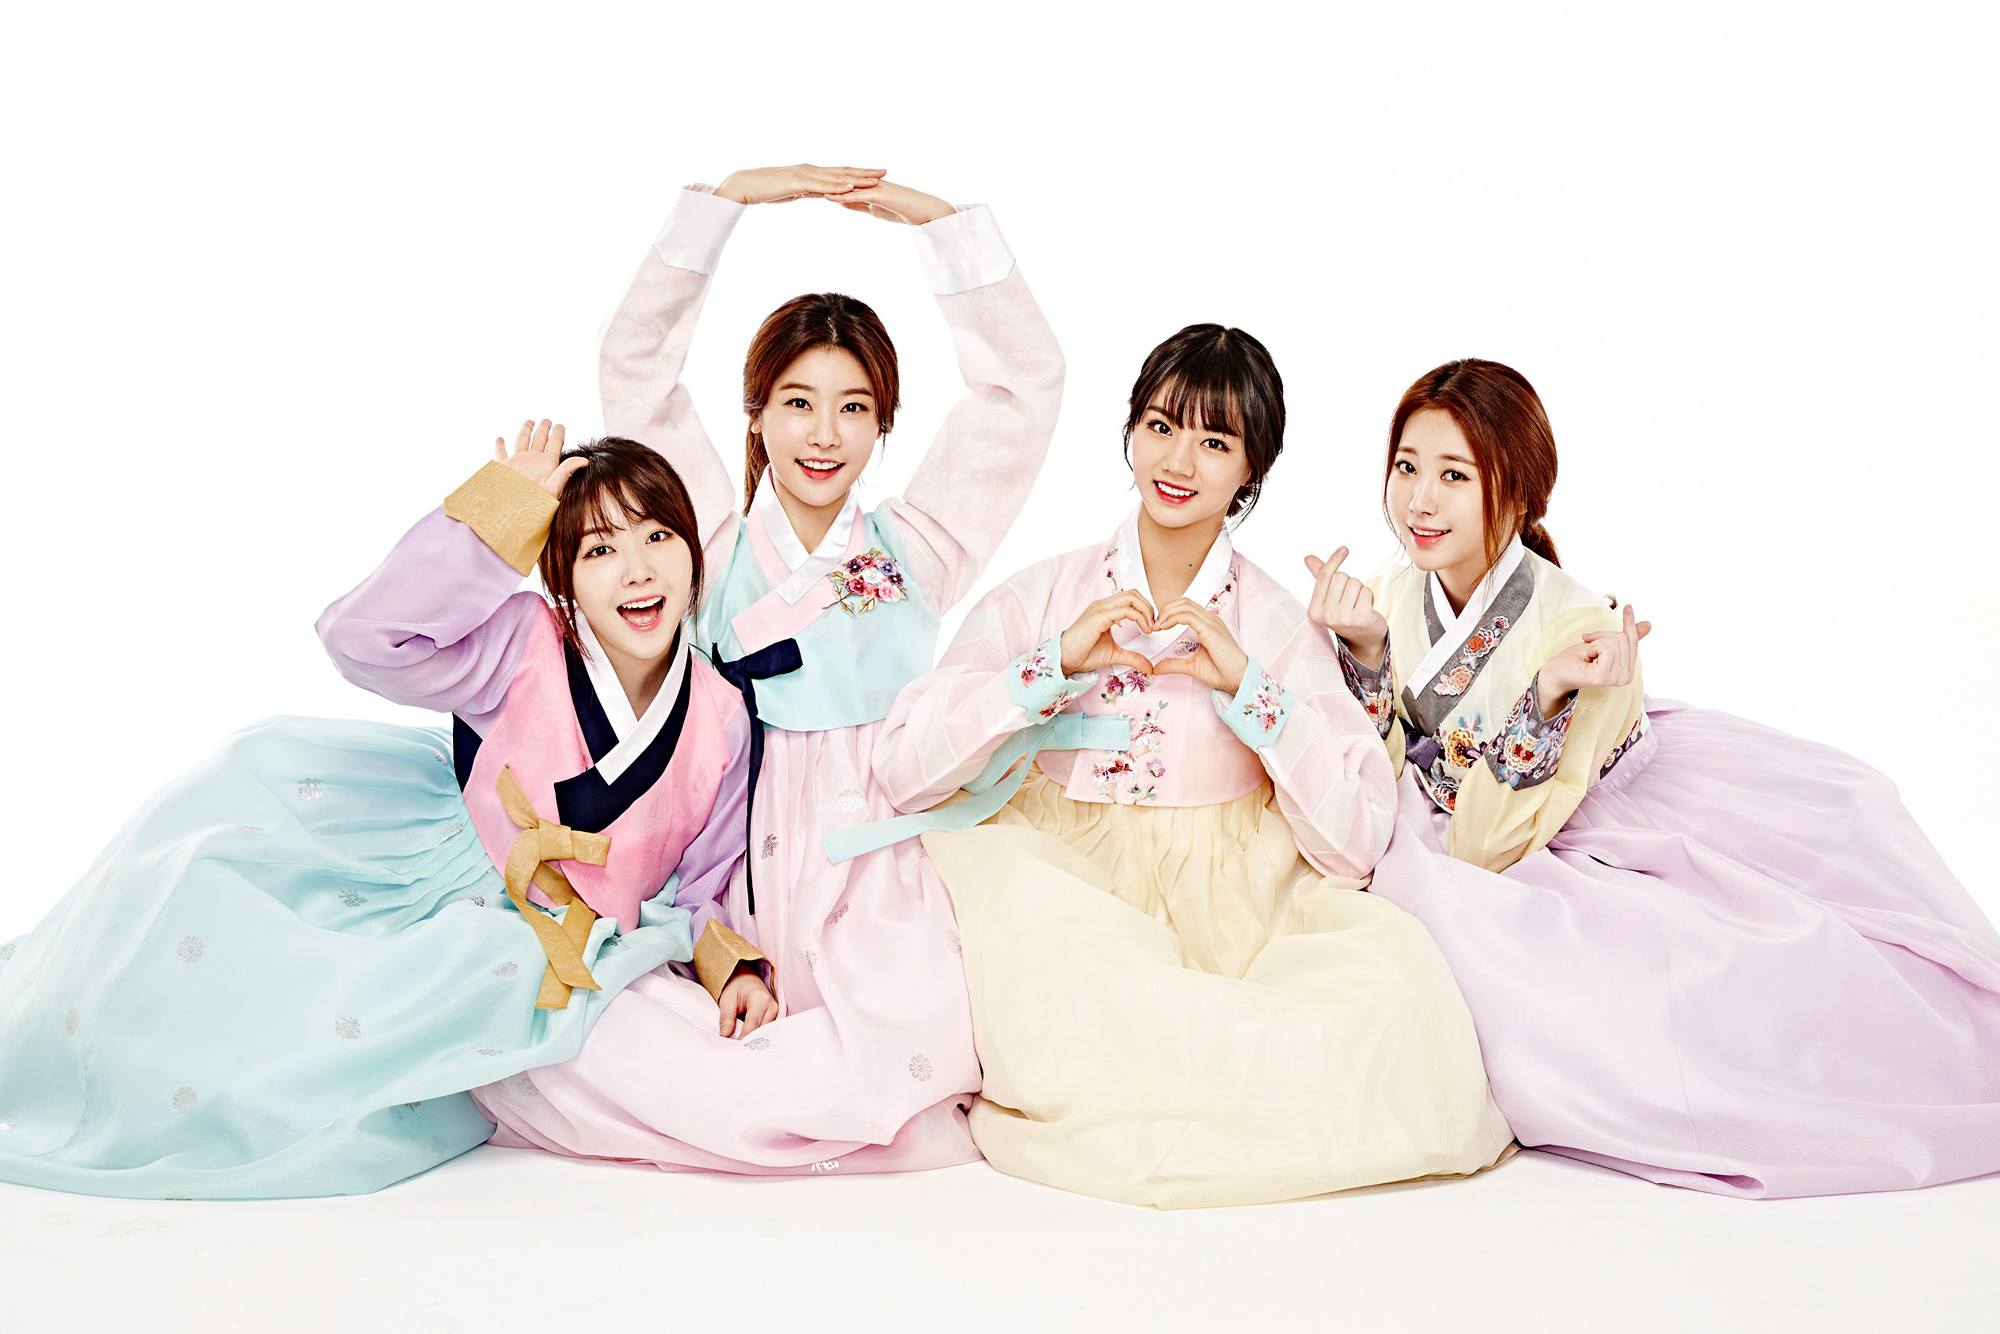 Girl's day 雖然今天已經是跨出韓國的一線女團,但是從她們出道至今不只經歷了換風格、團員換血等等的過程,更寫下了一個艱難的女團紀錄